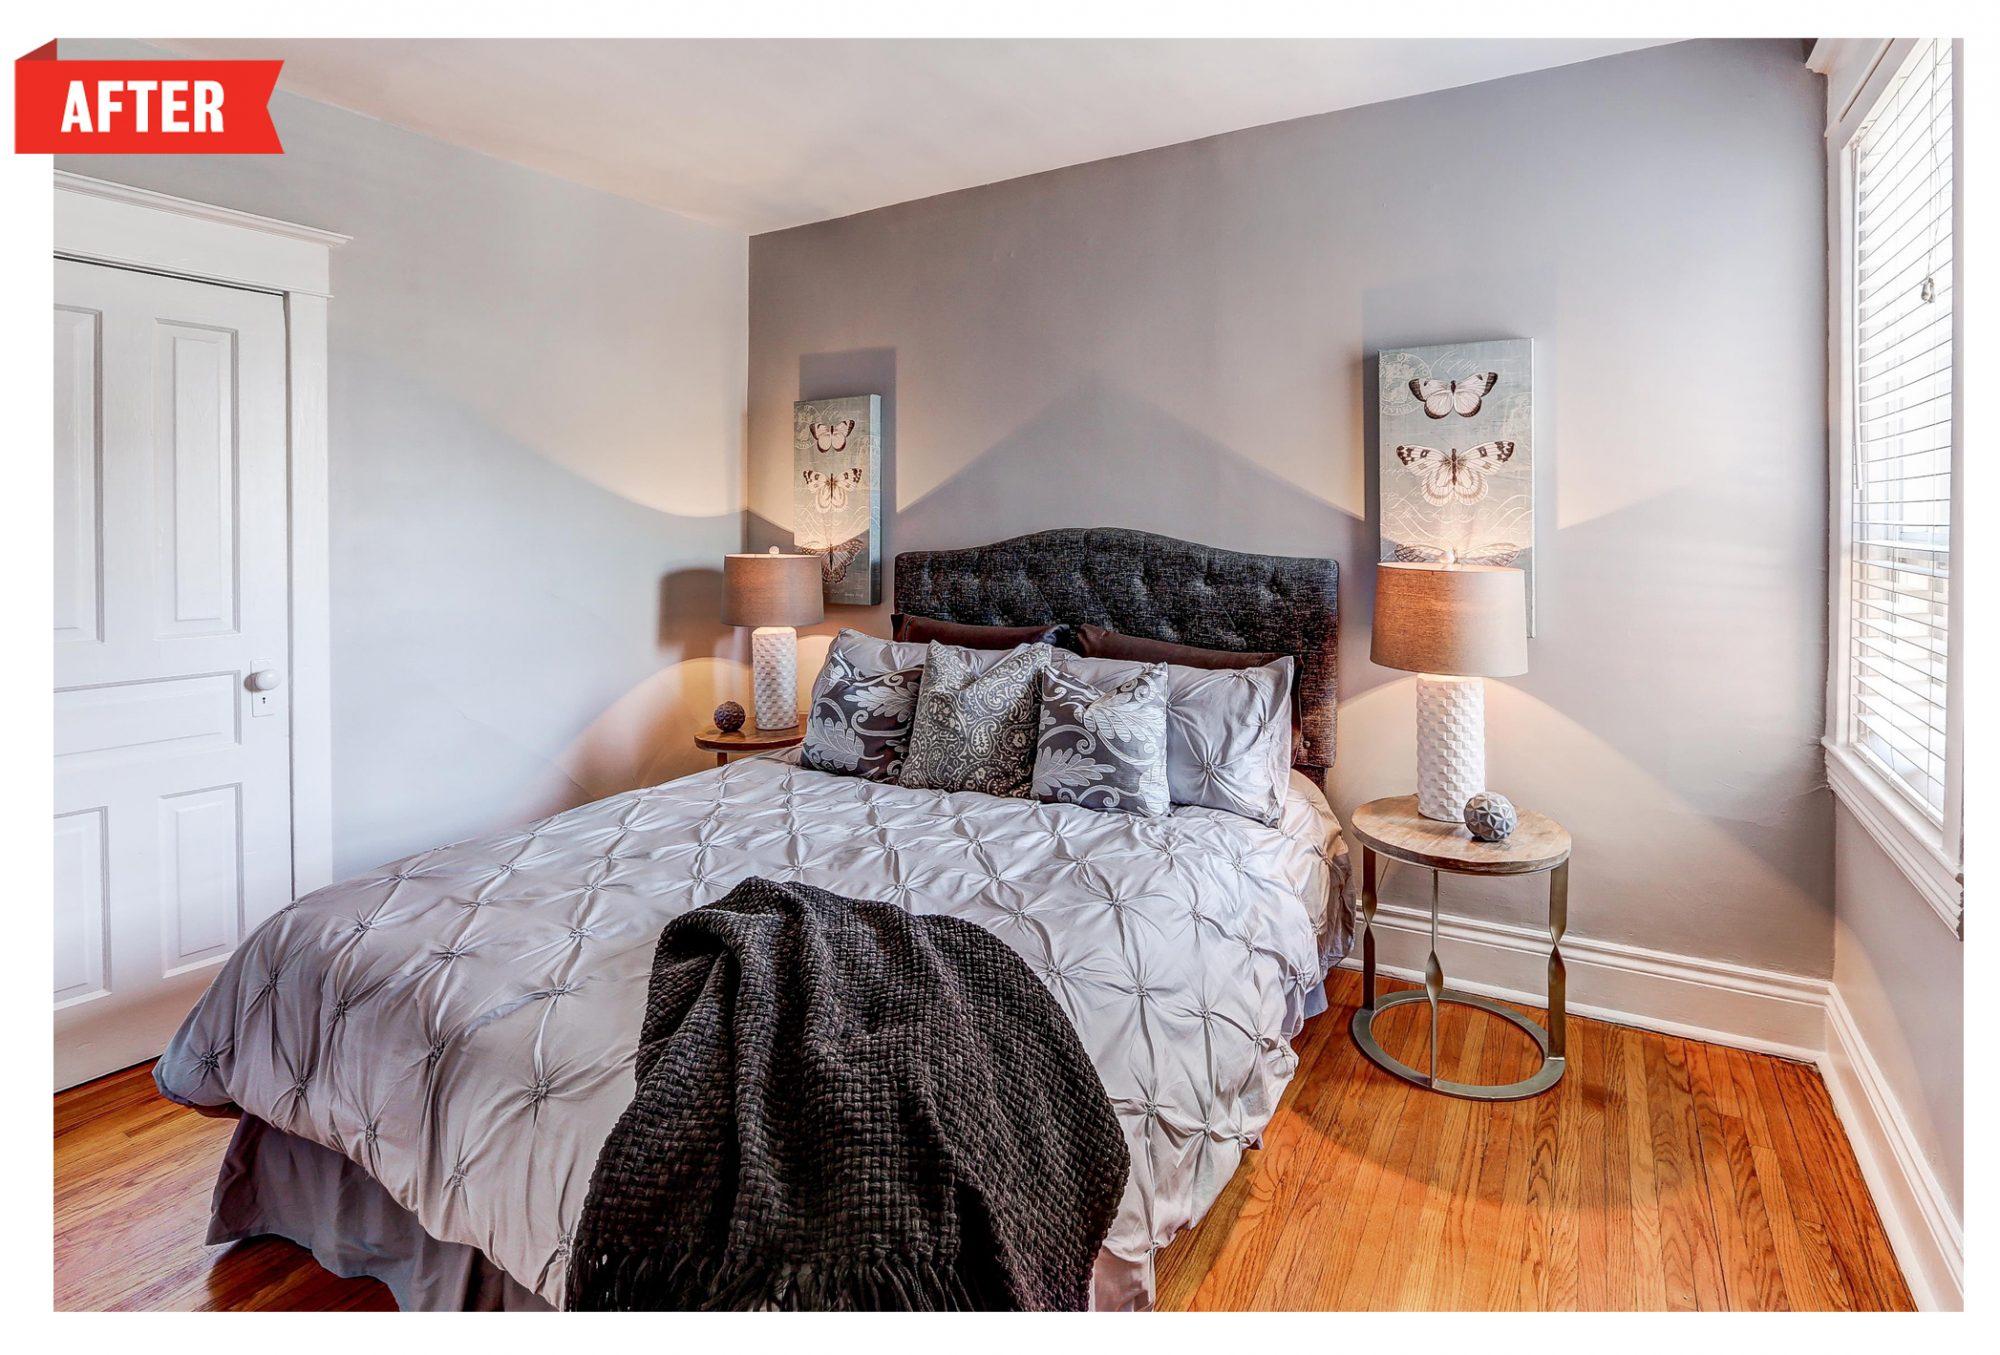 toronto-house-staging-318-montrose-avenue-guest-bedroom-after